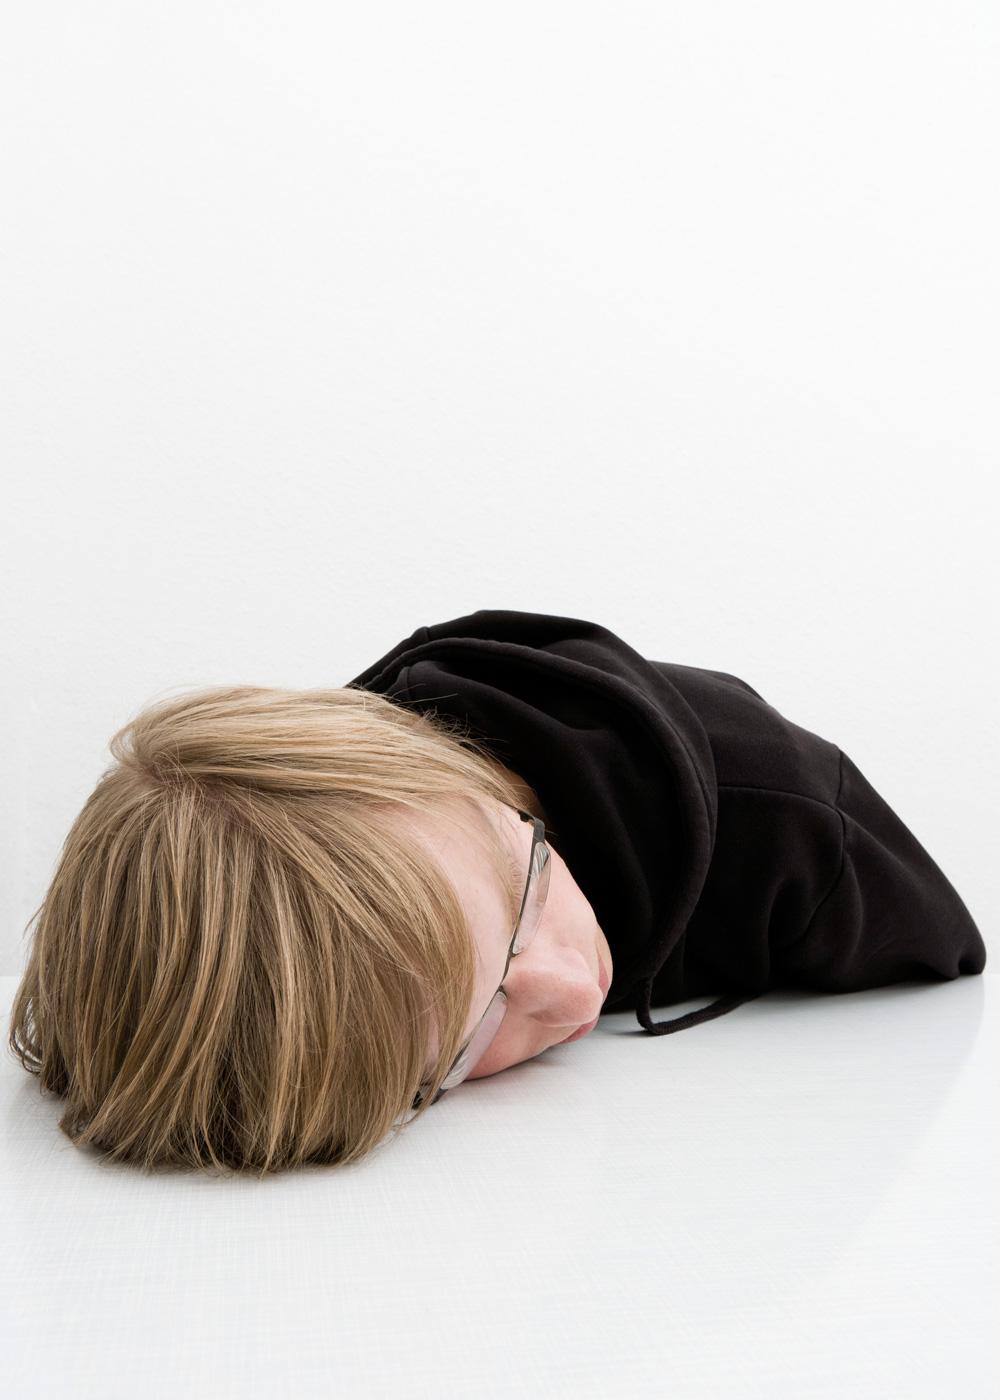 SLEEPER / PERSONAL WORK